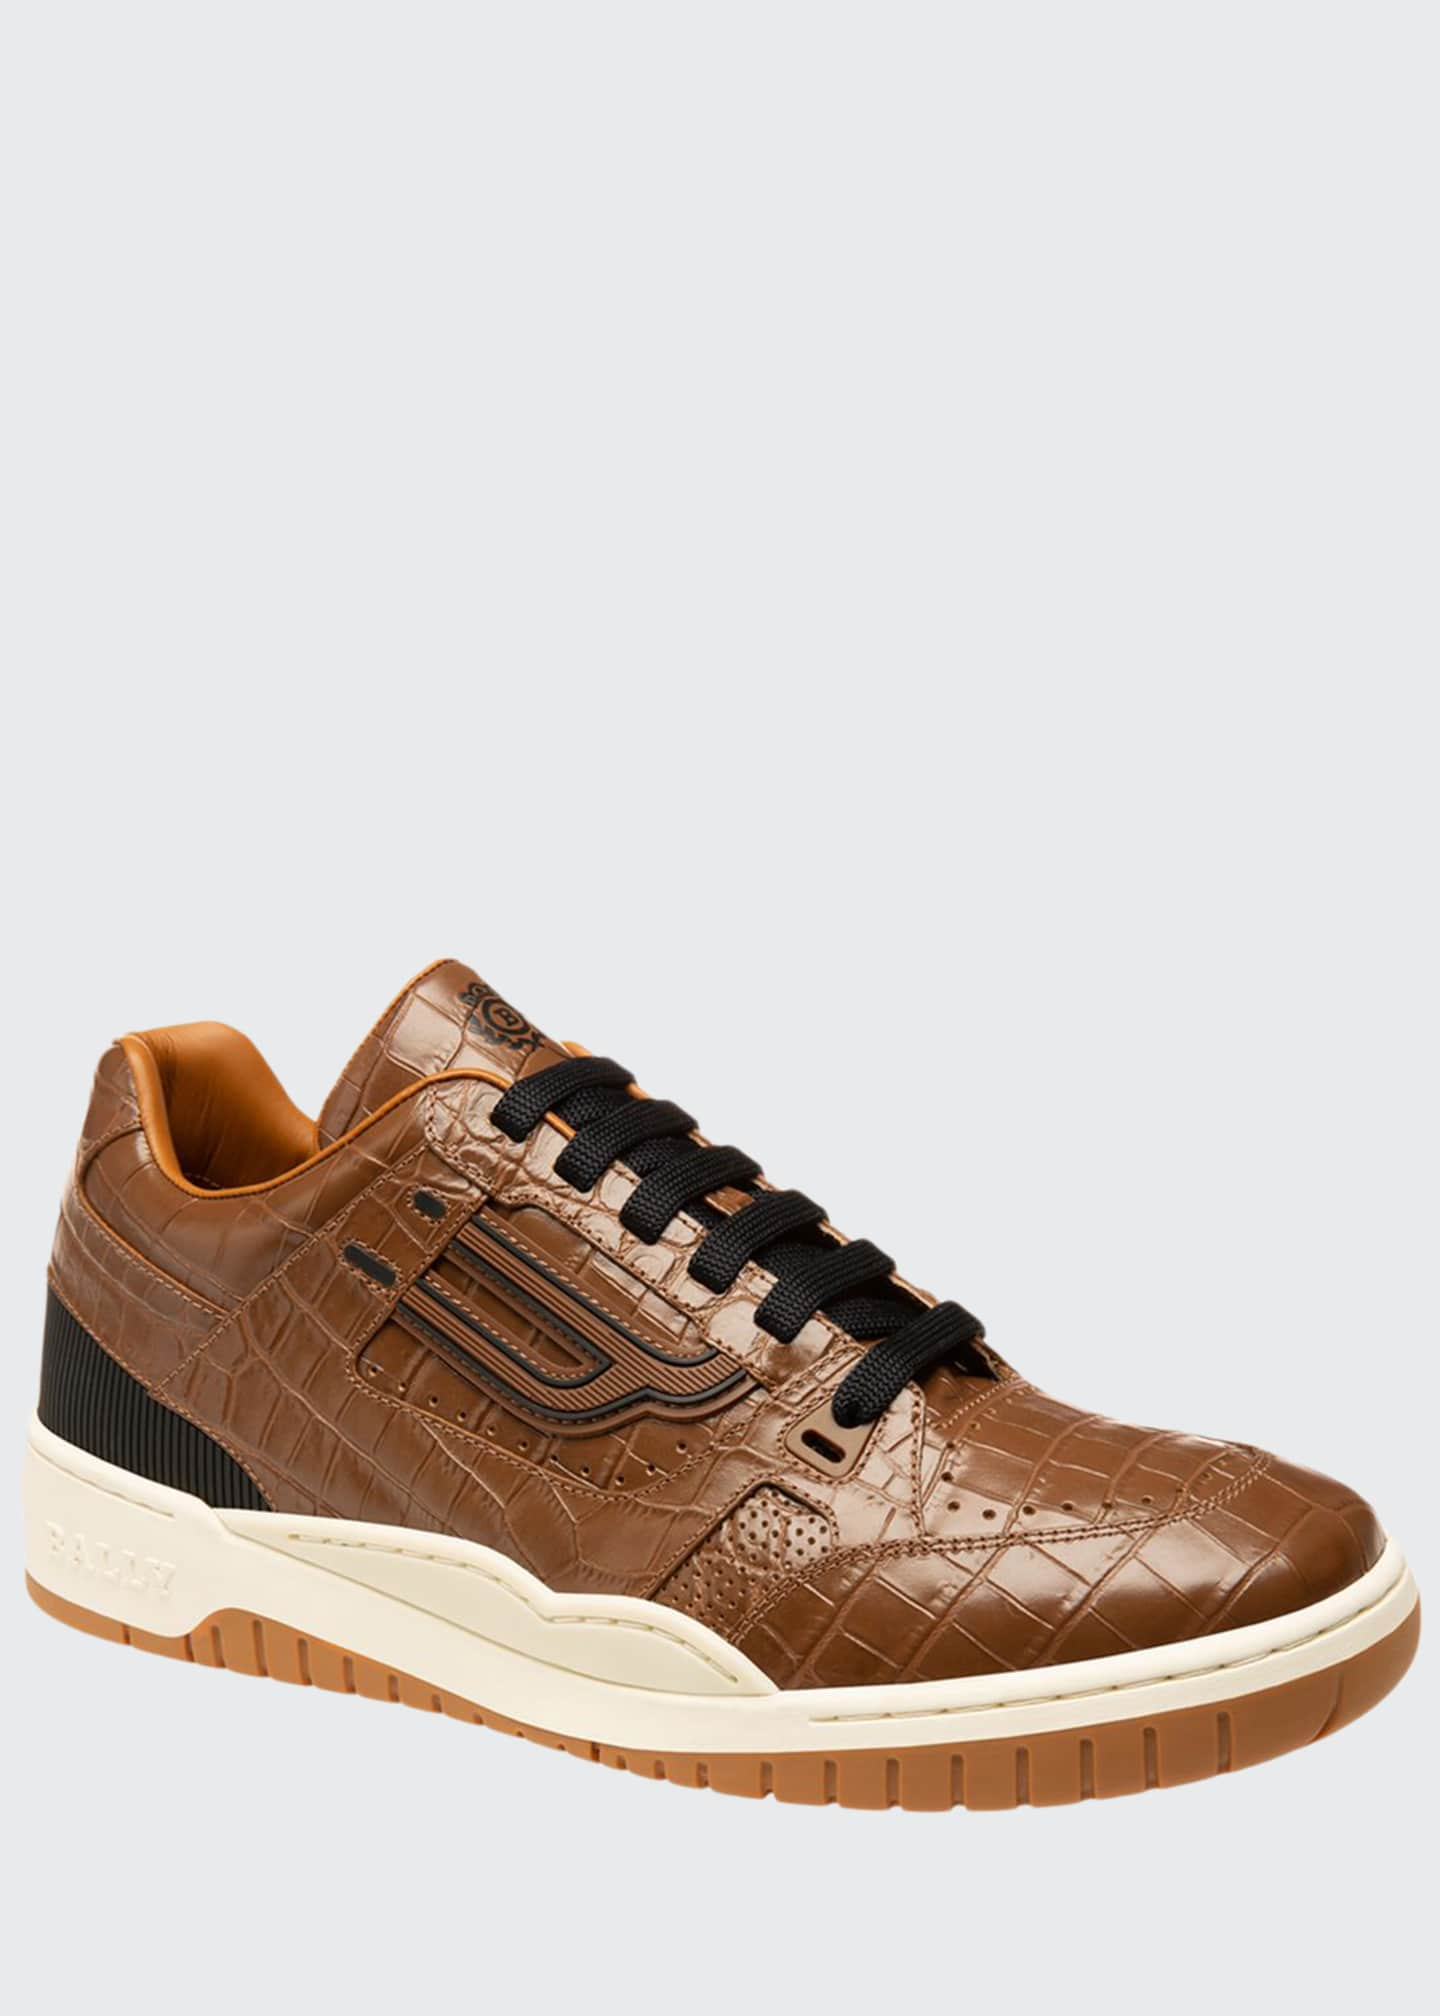 Bally Men's Kuba Croc-Embossed Leather Sneakers